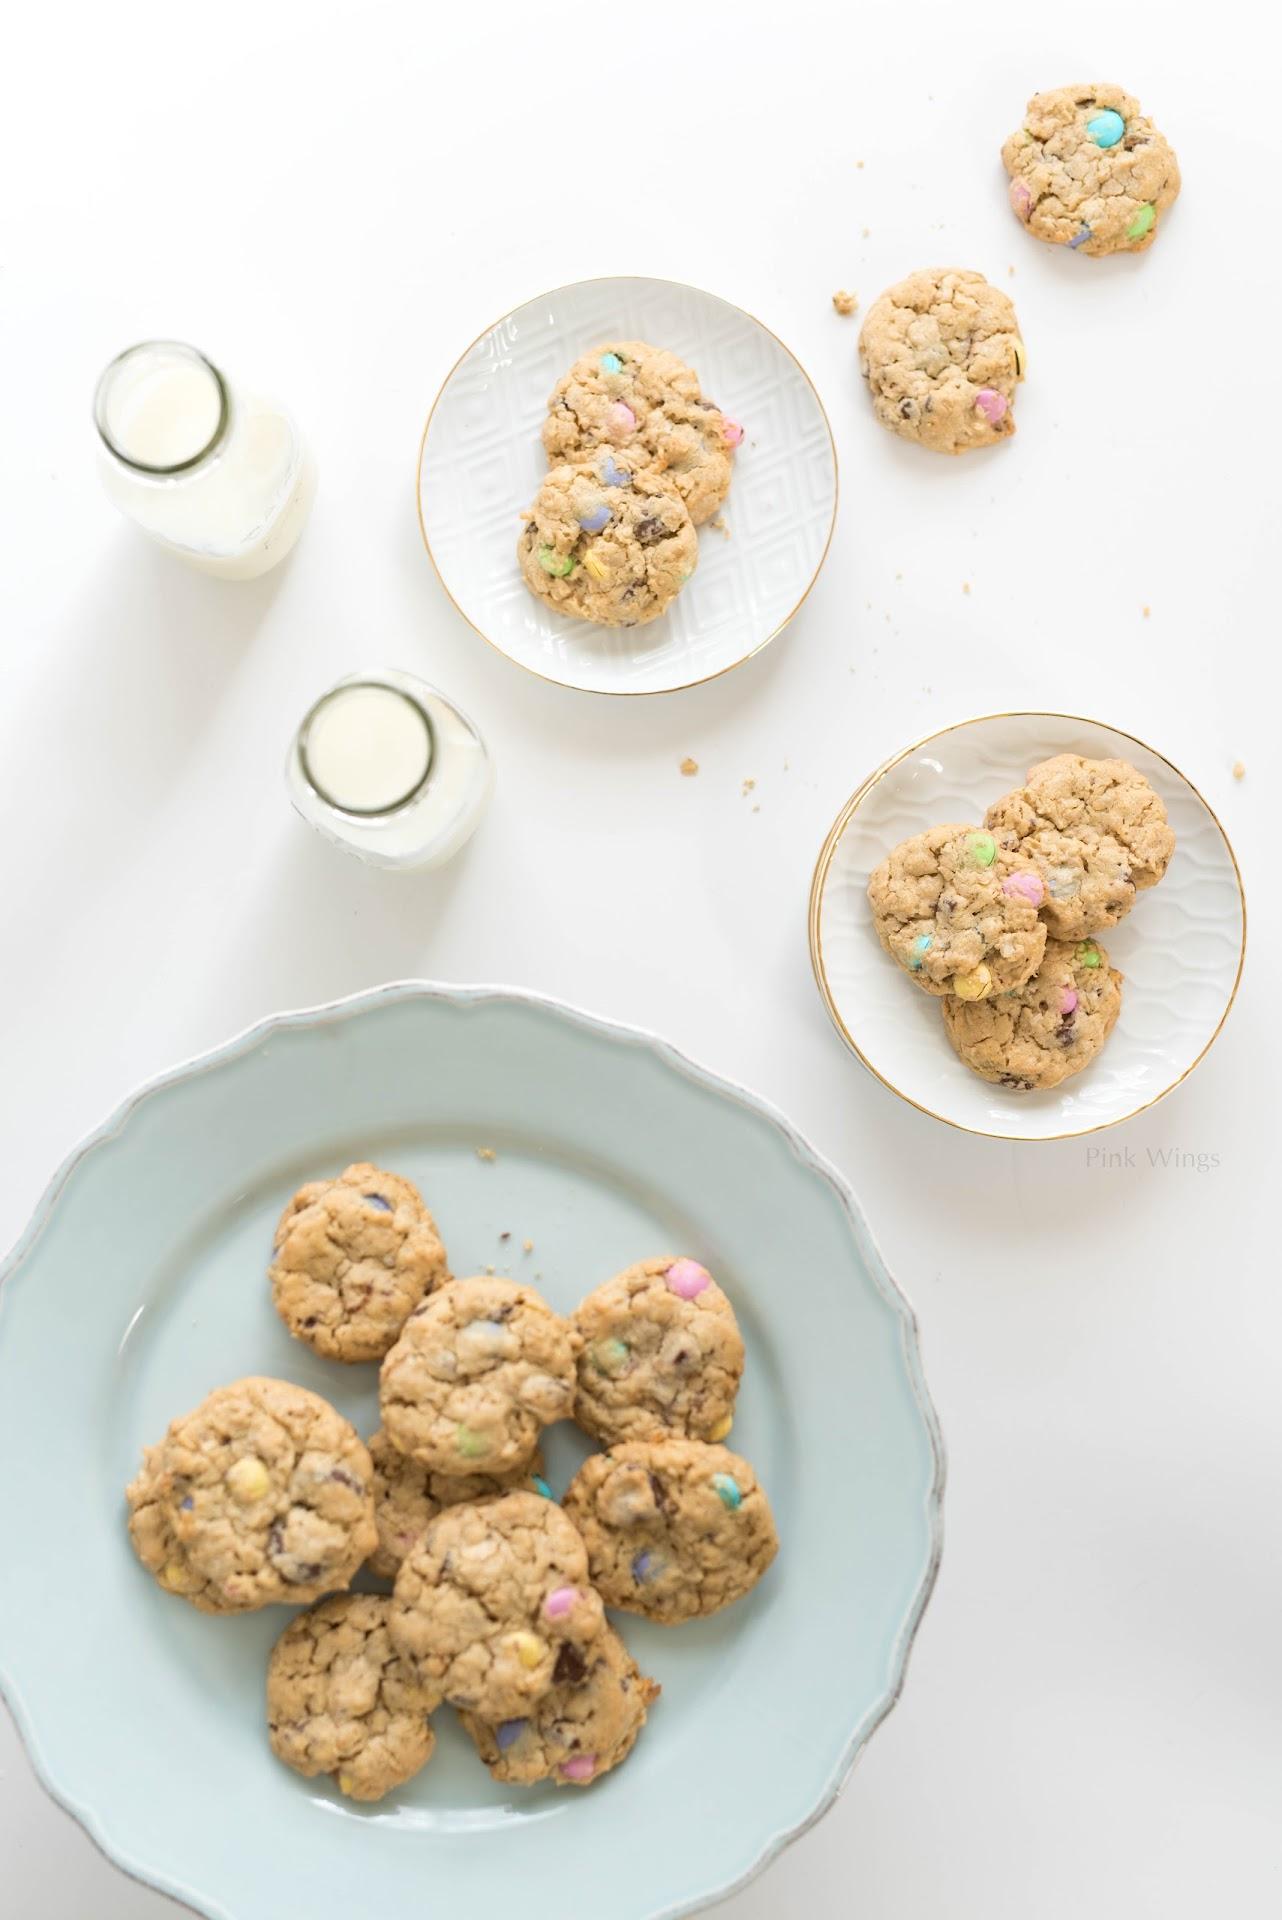 easter dessert recipe, easter cookie recipe, pastel dessert, hawaiian cookie recipe easy, hawaiian dessert recipe, hawaiian cookie recipe, hawaiian chocolate chip cookies, cookie exchange ideas, unique creative cookies, coconut cookies, macadamia nut recipe